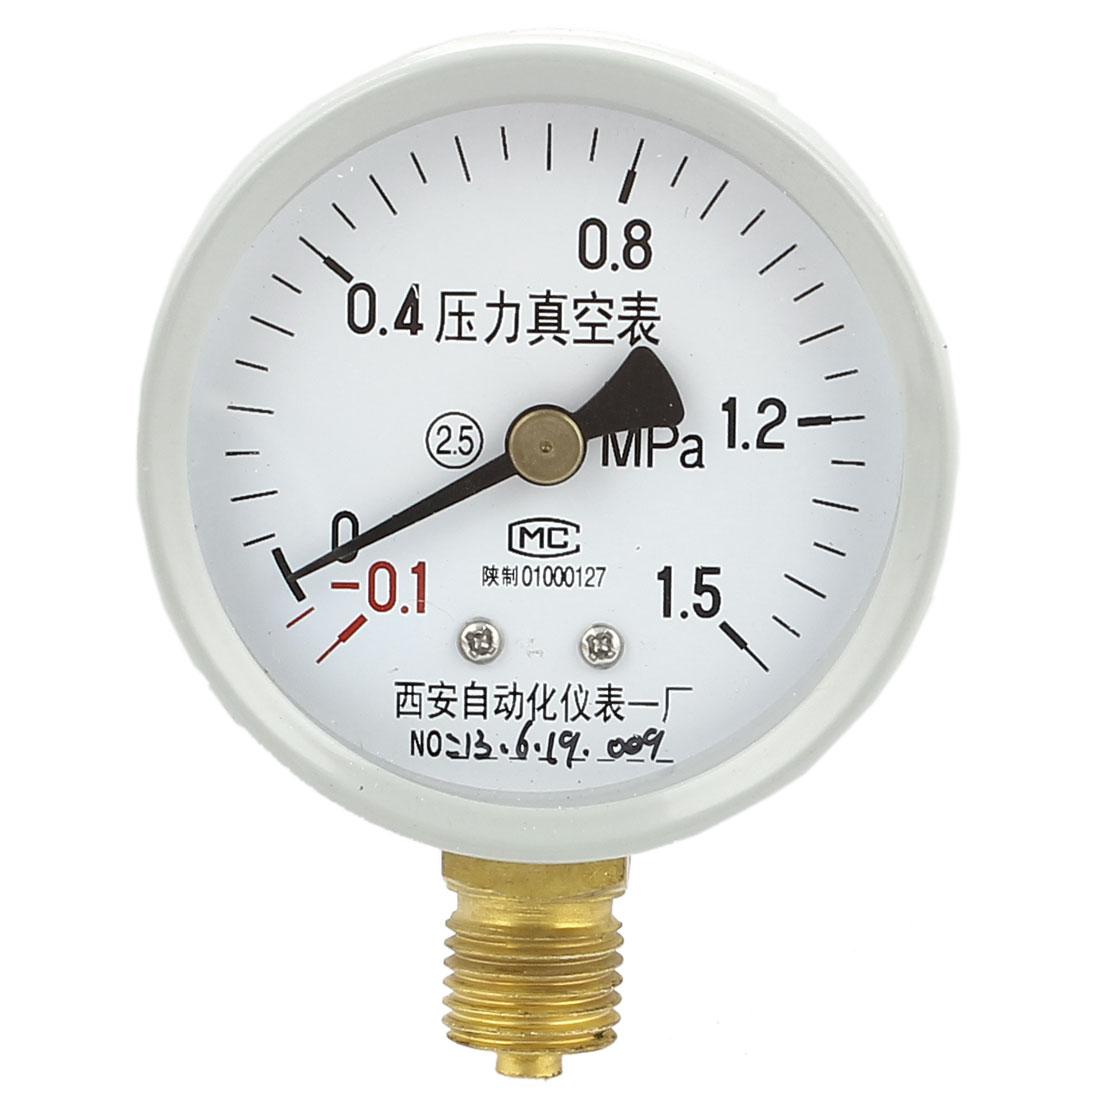 Universal -0.1MPa to 1.5MPa Glow Oil Gas Air Vacuum Pressure Meter Gauge 60mm